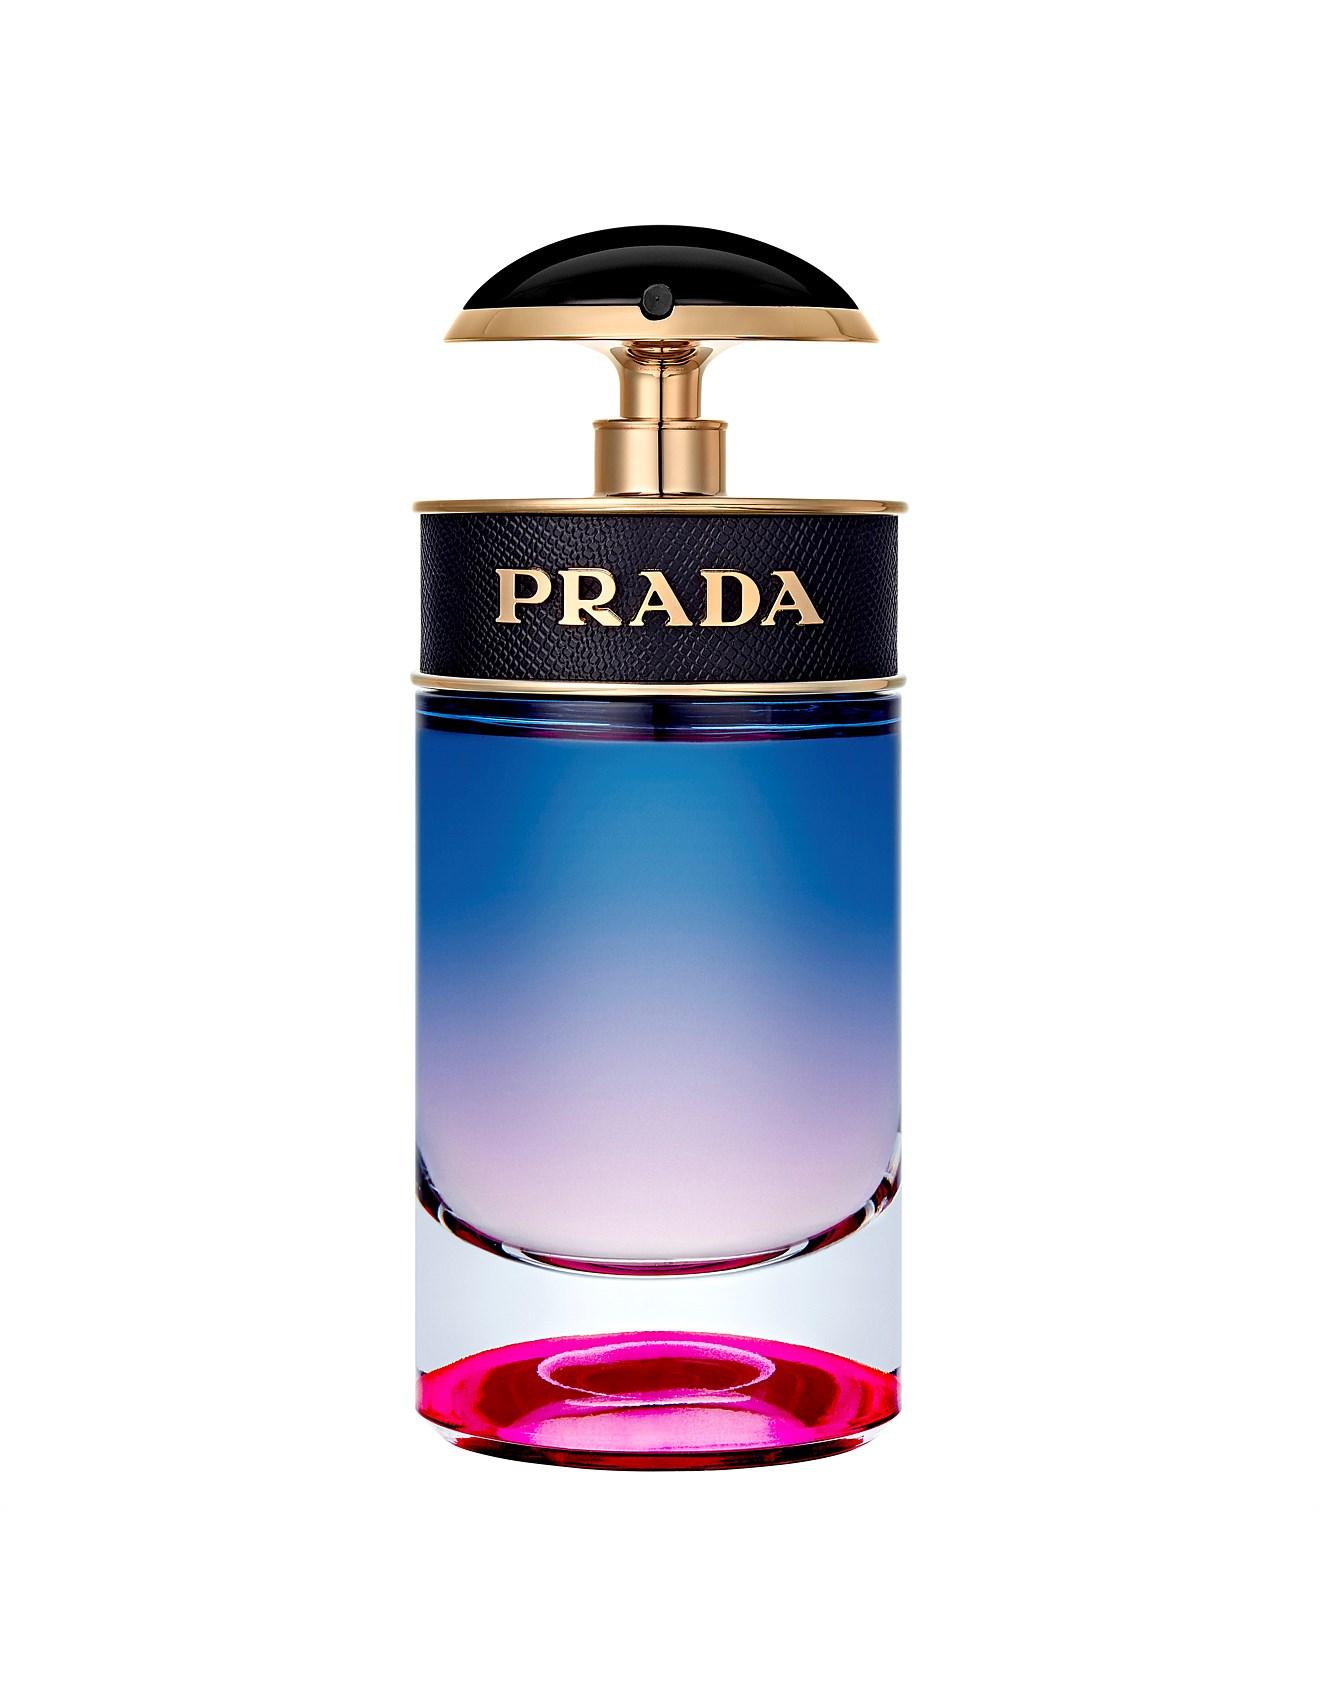 017be8a1eb8d Perfume   Buy Fragrances & Perfume Online   David Jones - Prada Candy Night  EDP 50ml